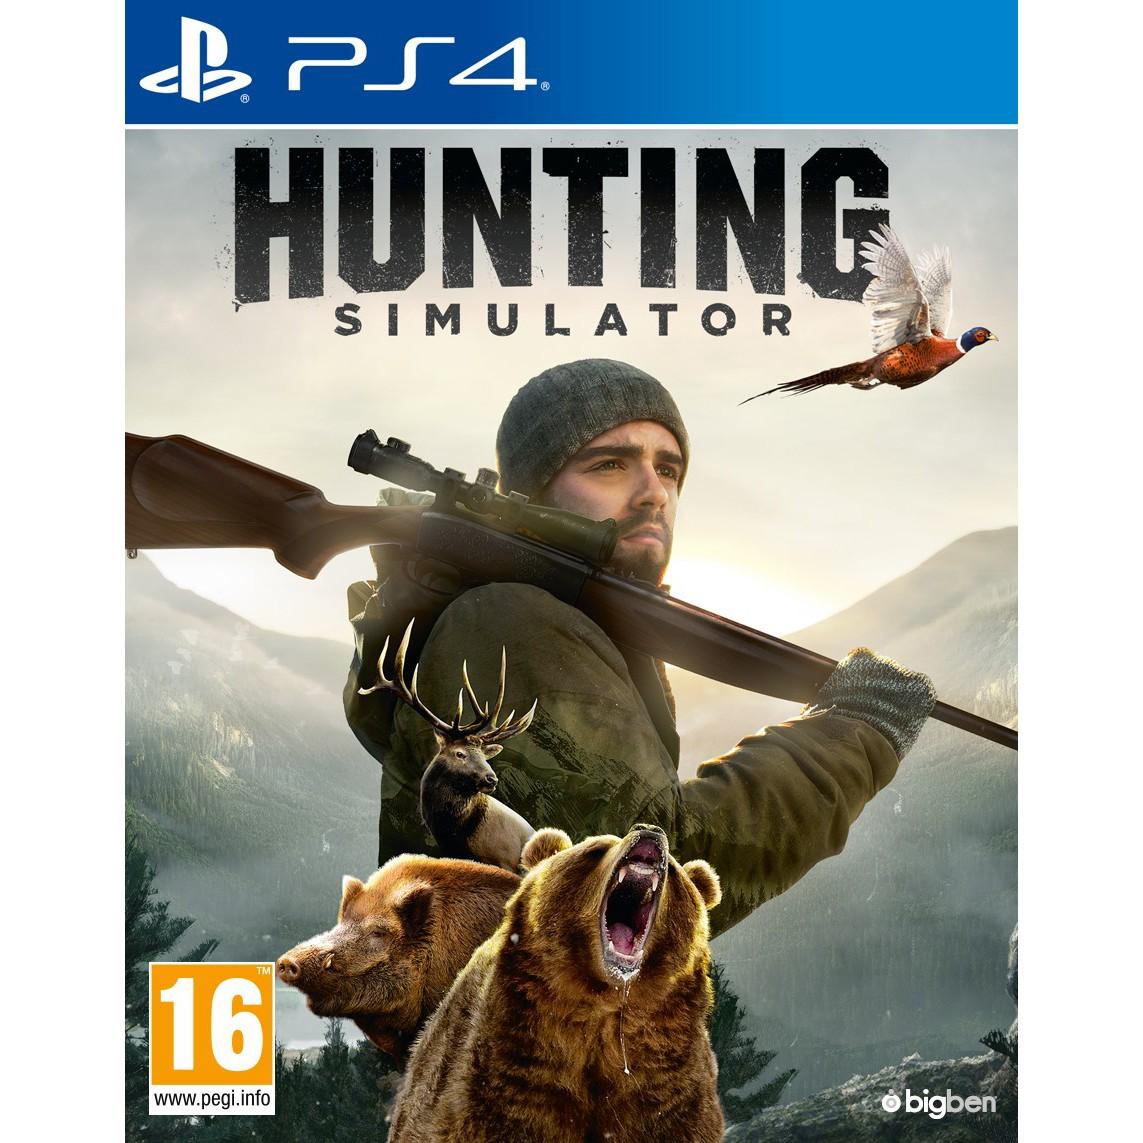 BIG6243 : Hunting Simulator (PS4)